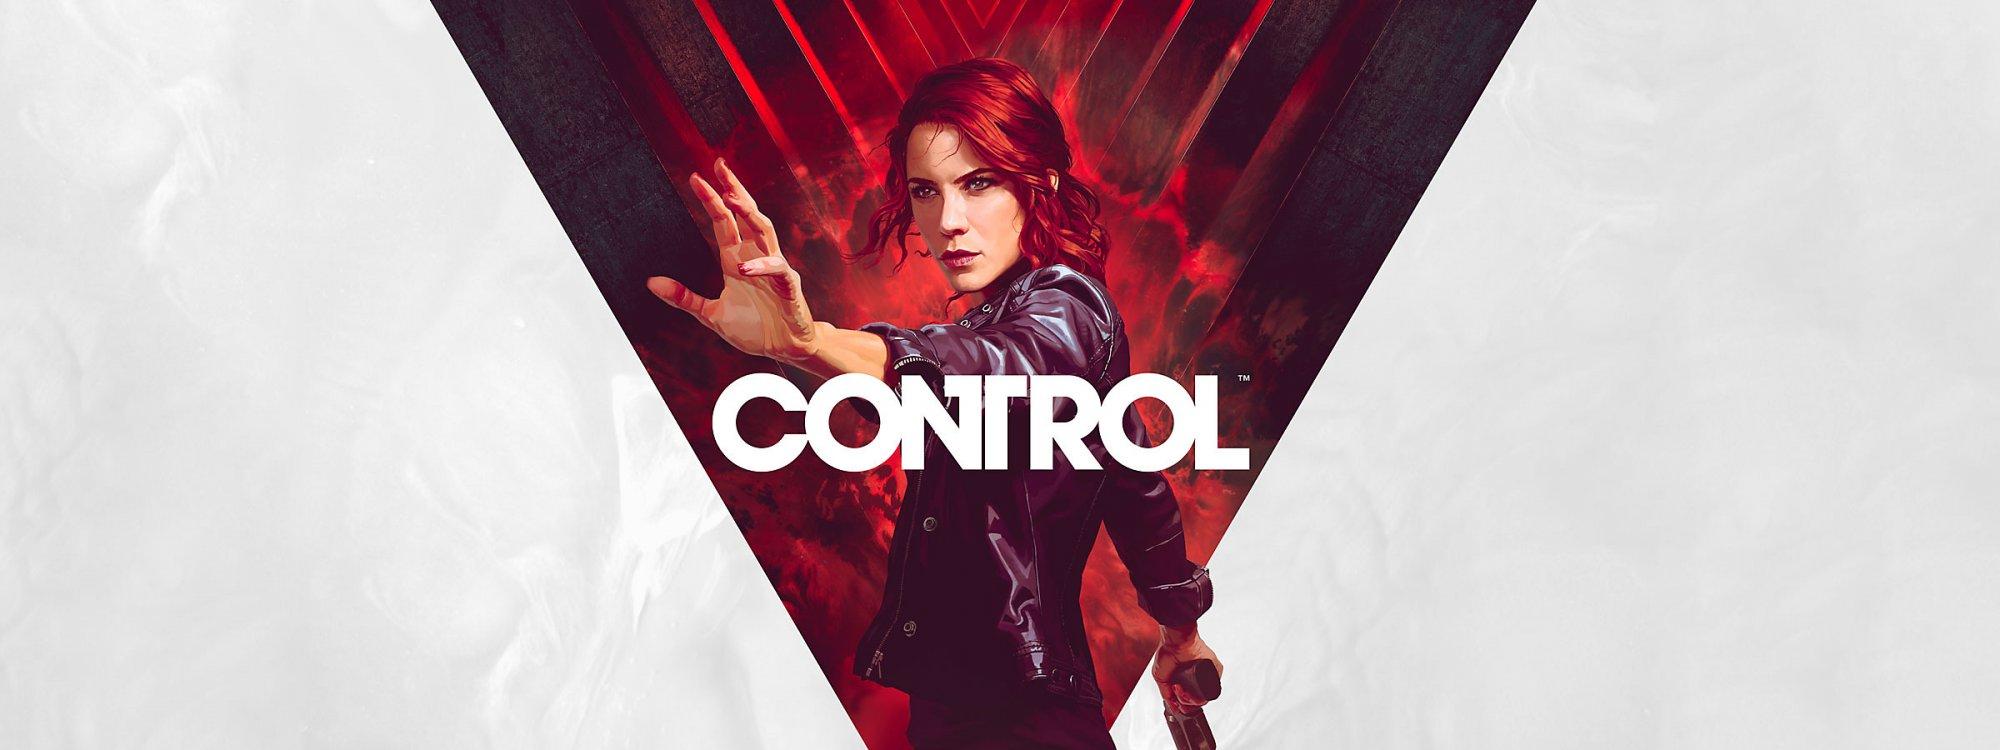 control-hero-banner-01-ps4-us-11sep19.jpg